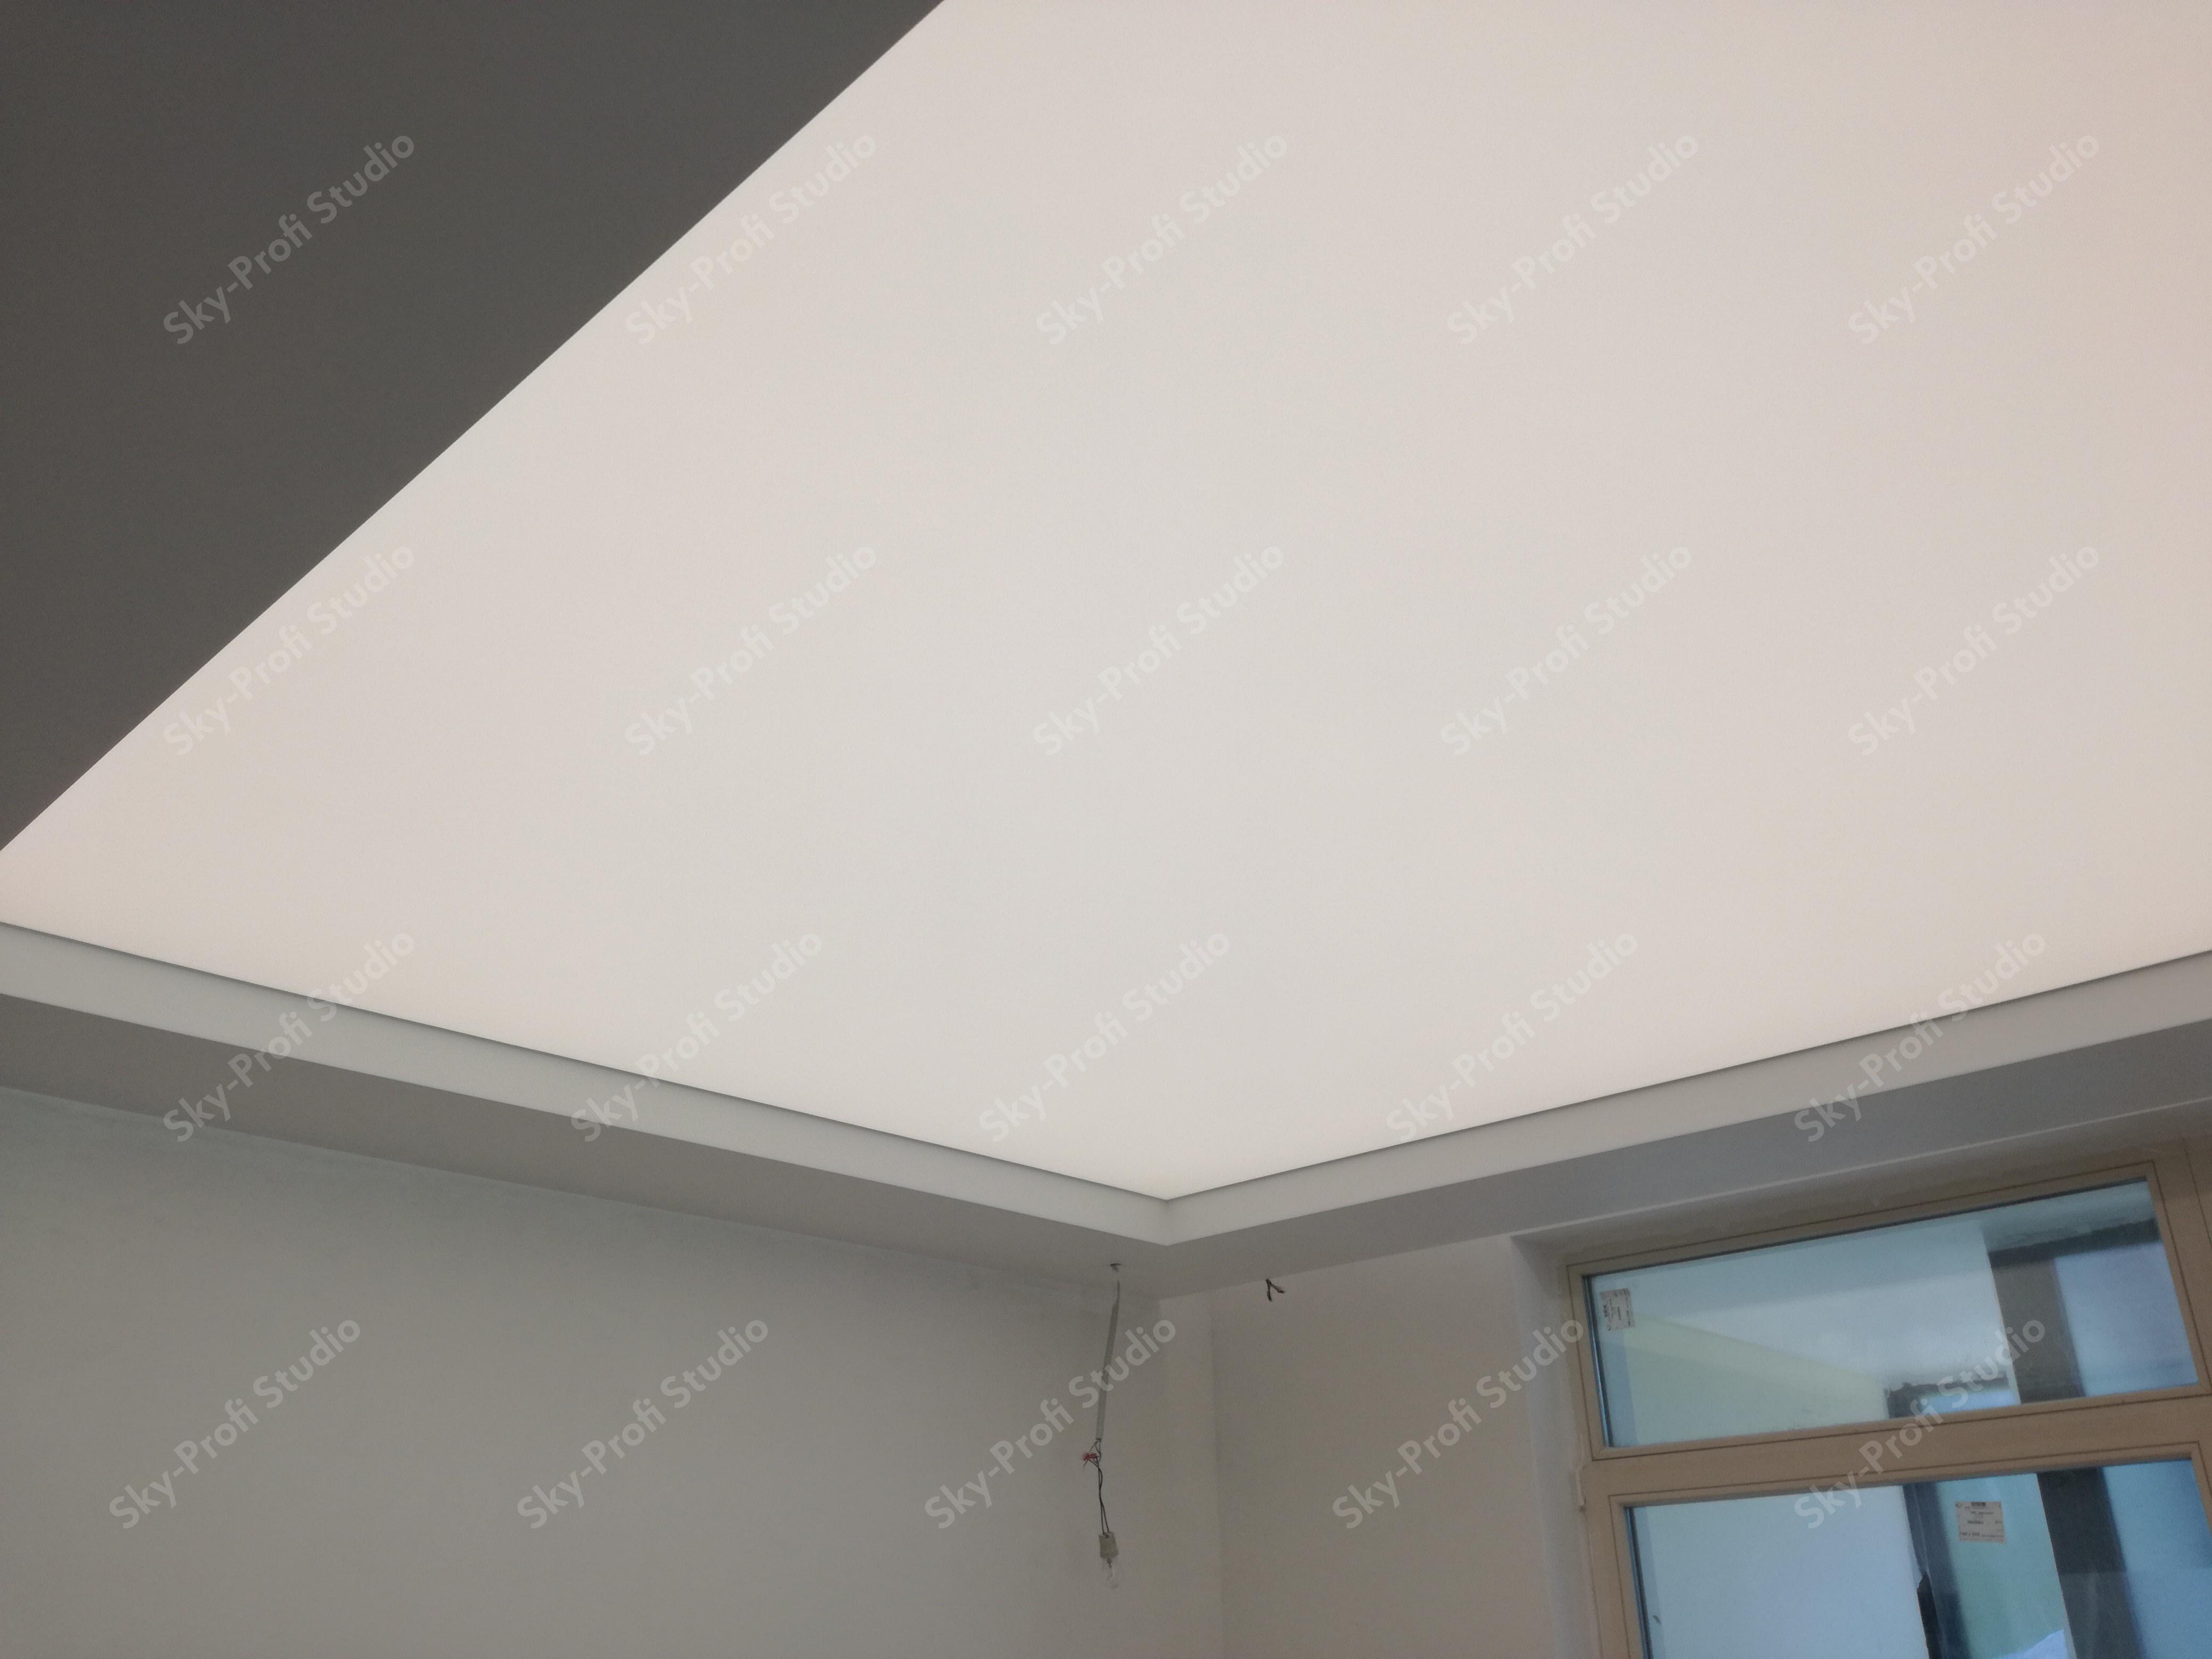 lights_ceiling